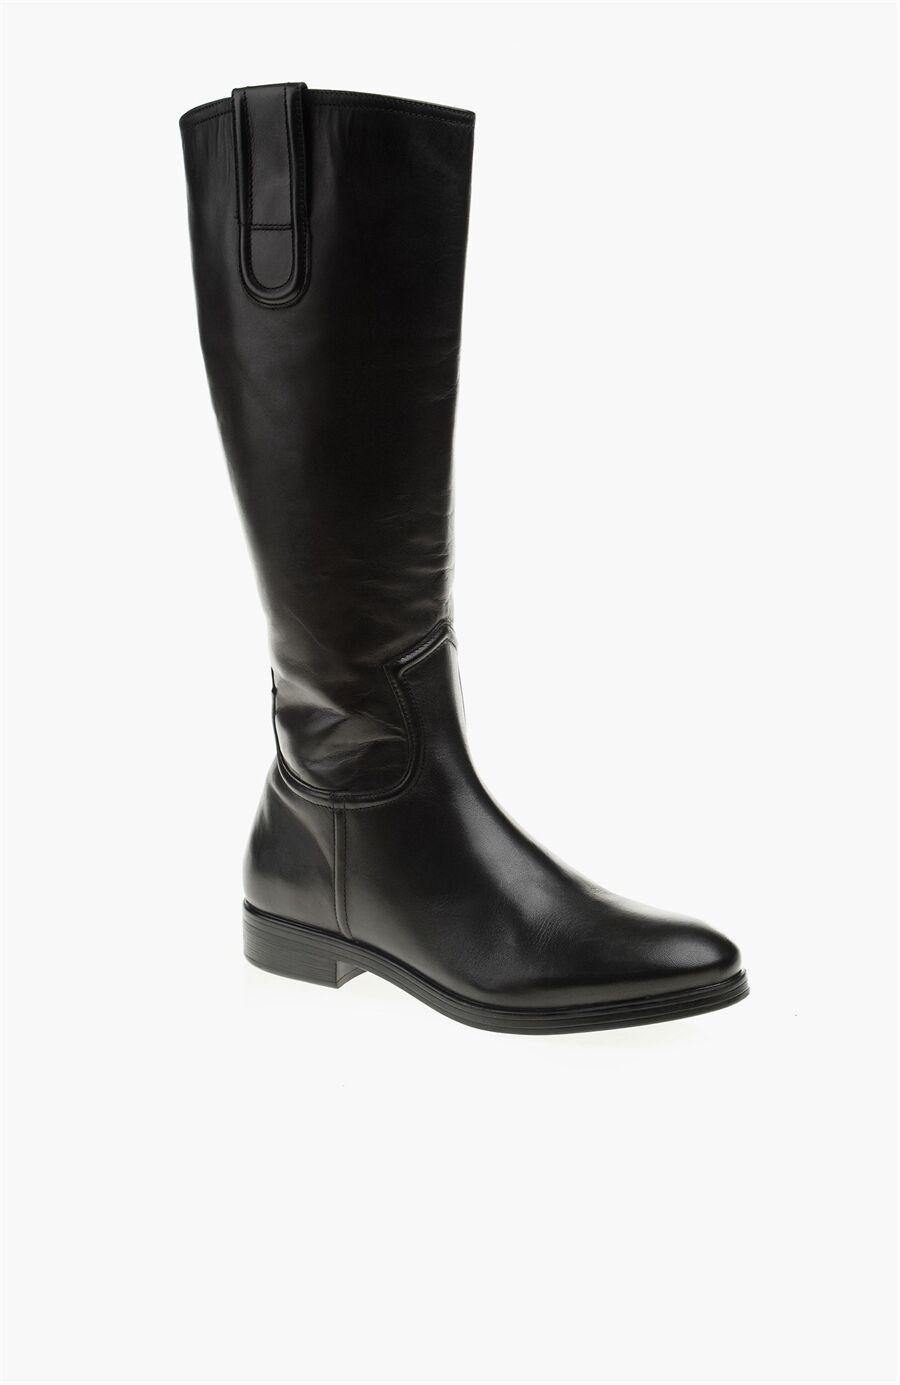 Dıvarese Siyah Çizme – 399.0 TL